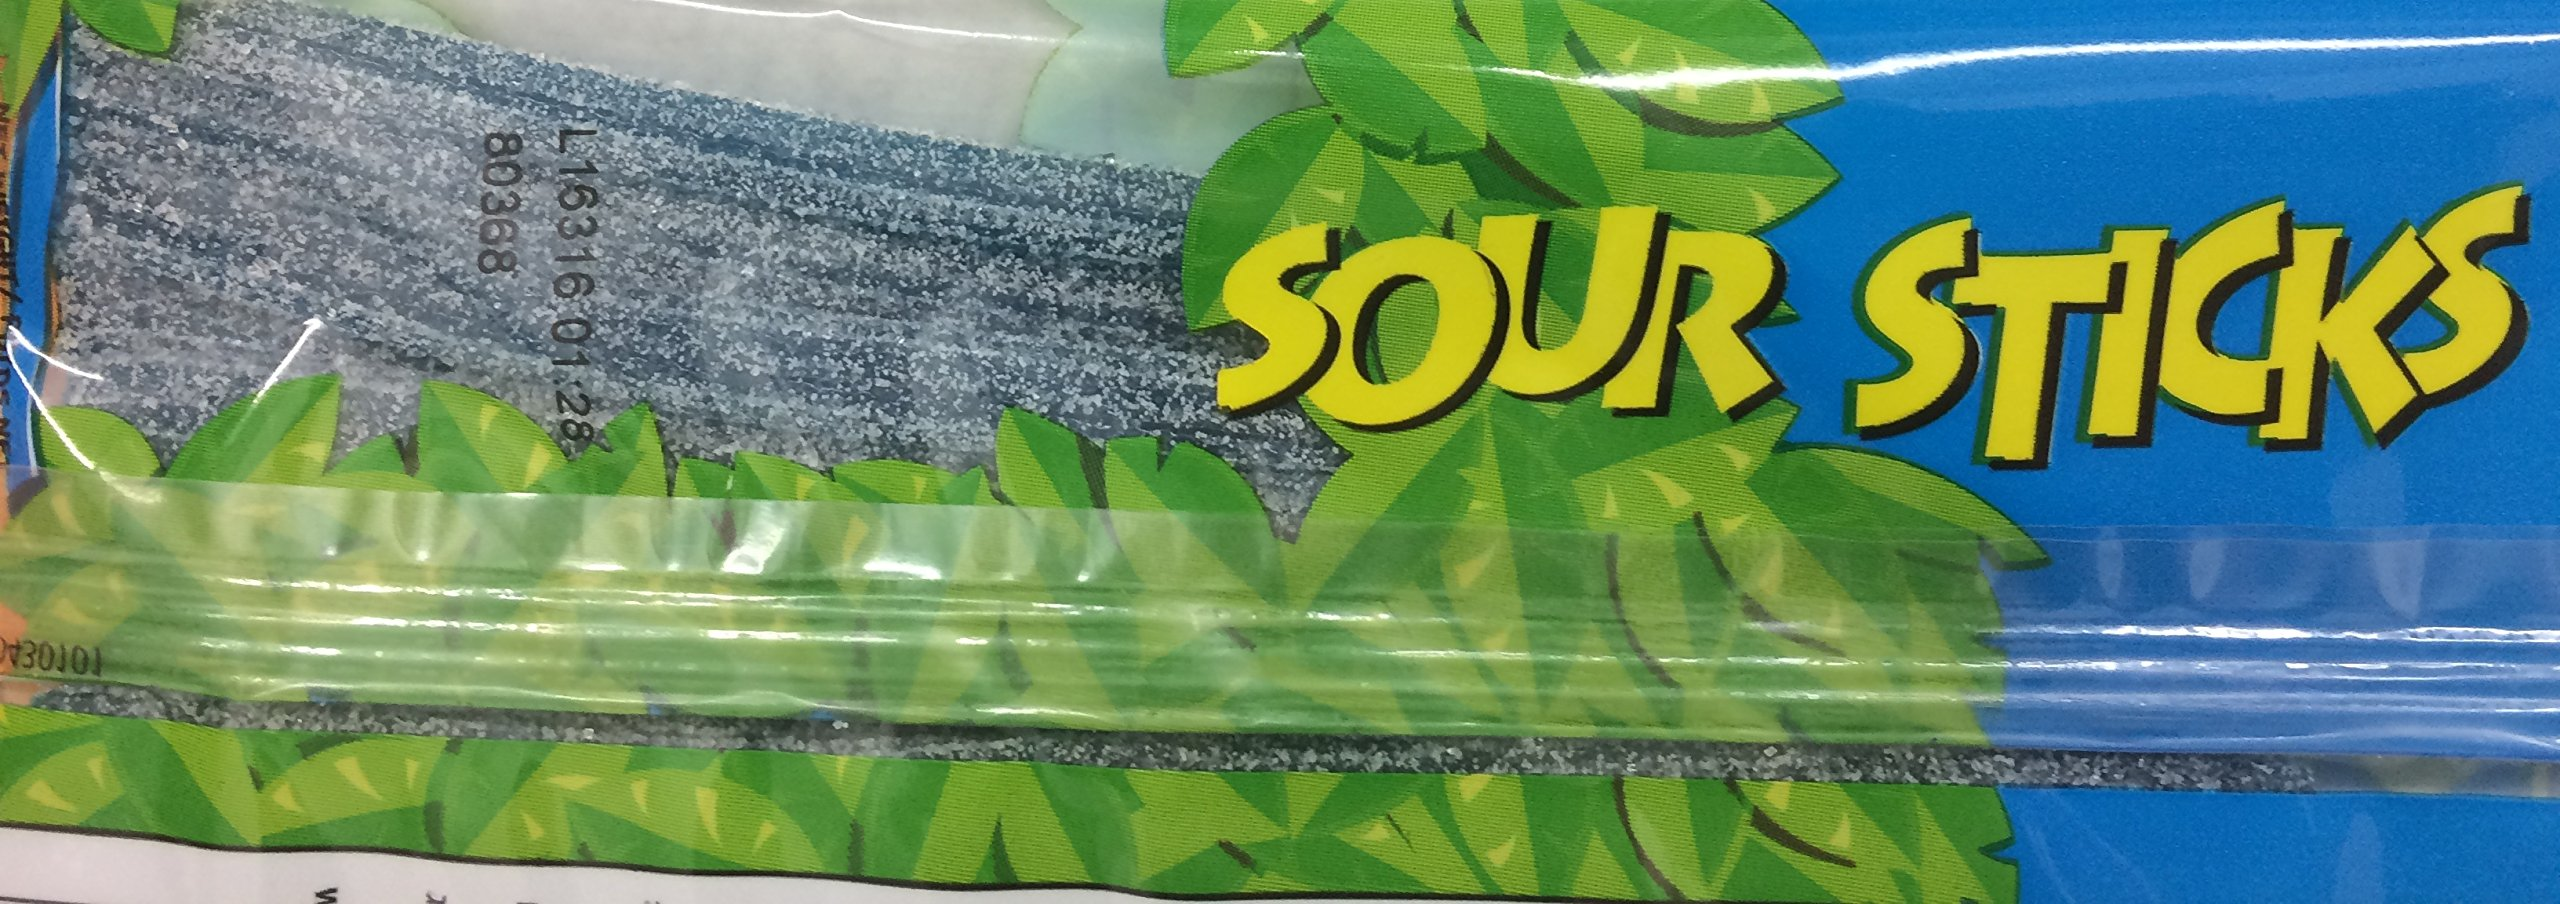 Paskesz Sour Sticks Raspberry Flavored Sticks 3.5 Oz. Pack Of 3.